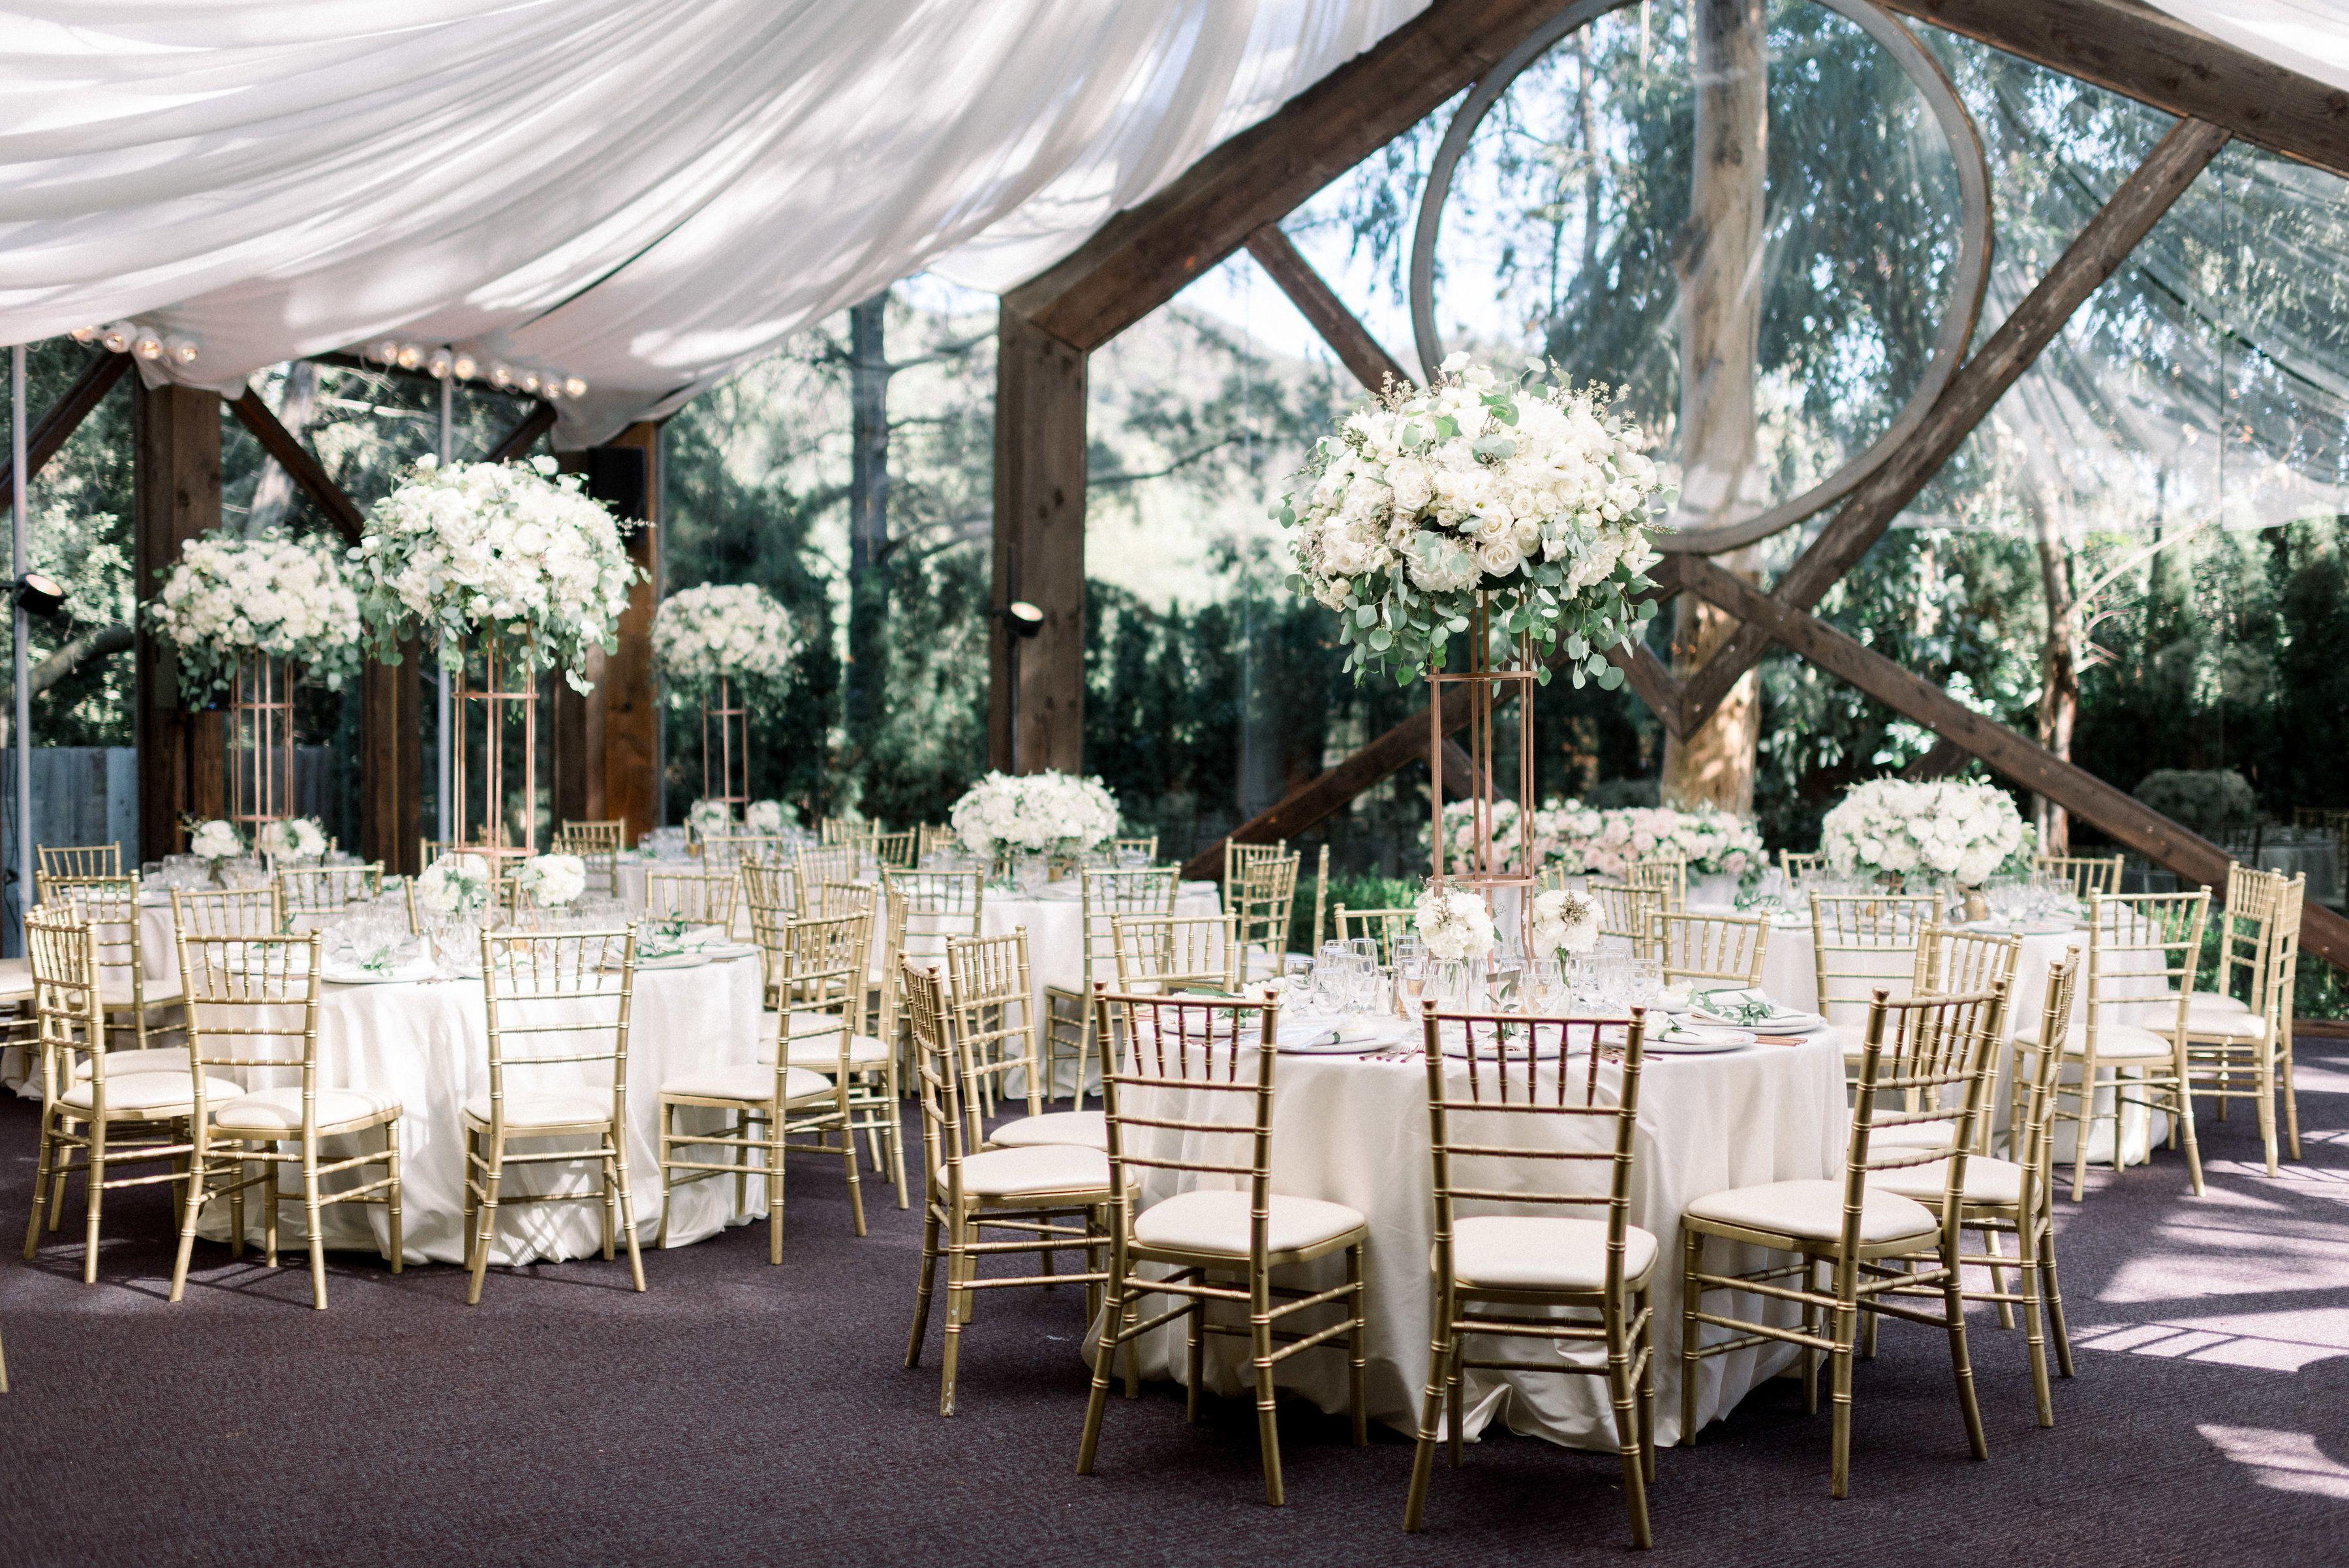 Calamigos Ranch August 2018 In 2020 Calamigos Ranch Wedding Fairytale Wedding Centerpieces Calamigos Ranch